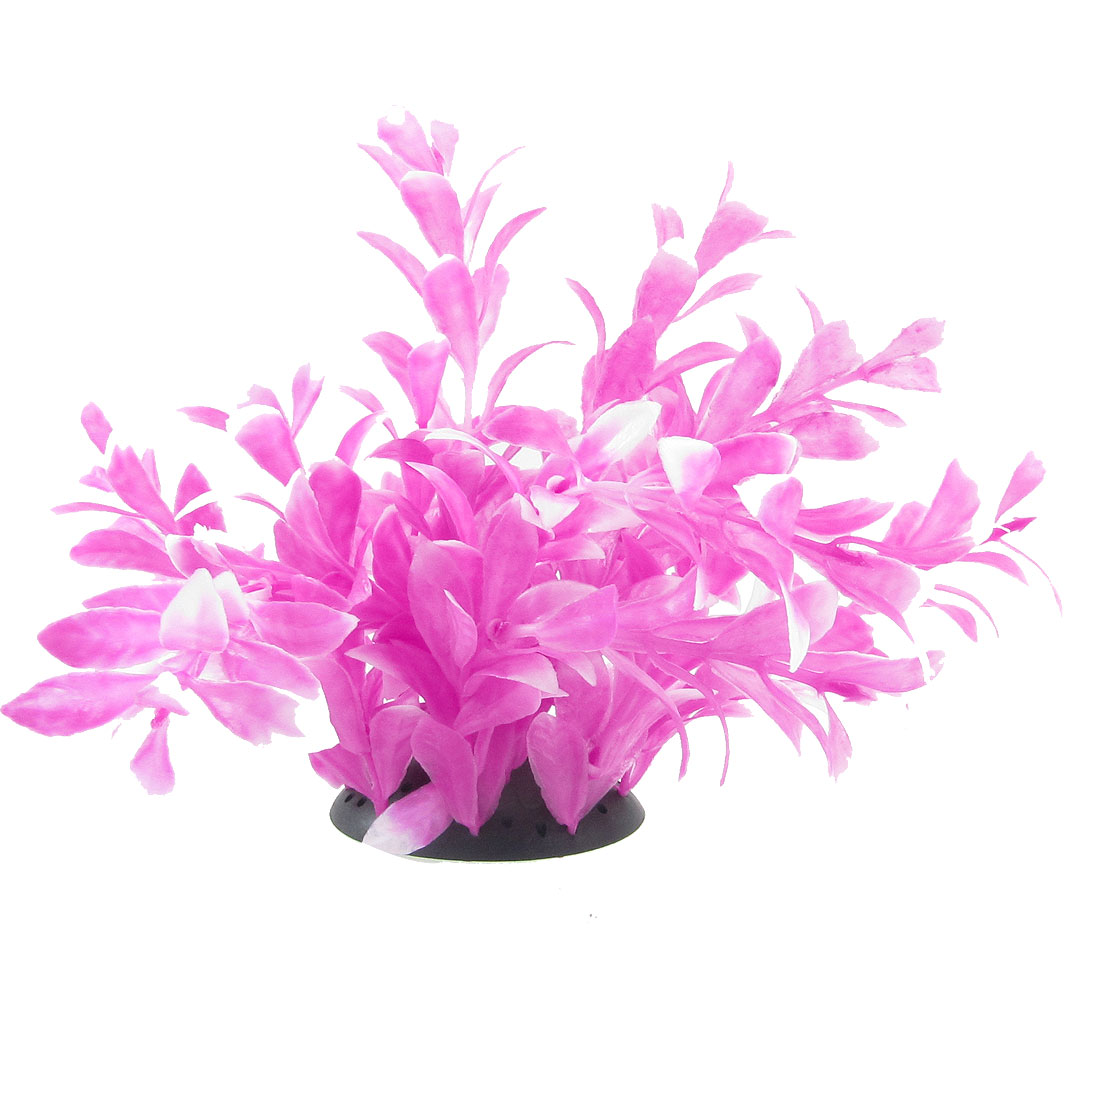 "7.1"" Fuchsia Plastic Fish Tank Aquarium Ornament Plant w Base"